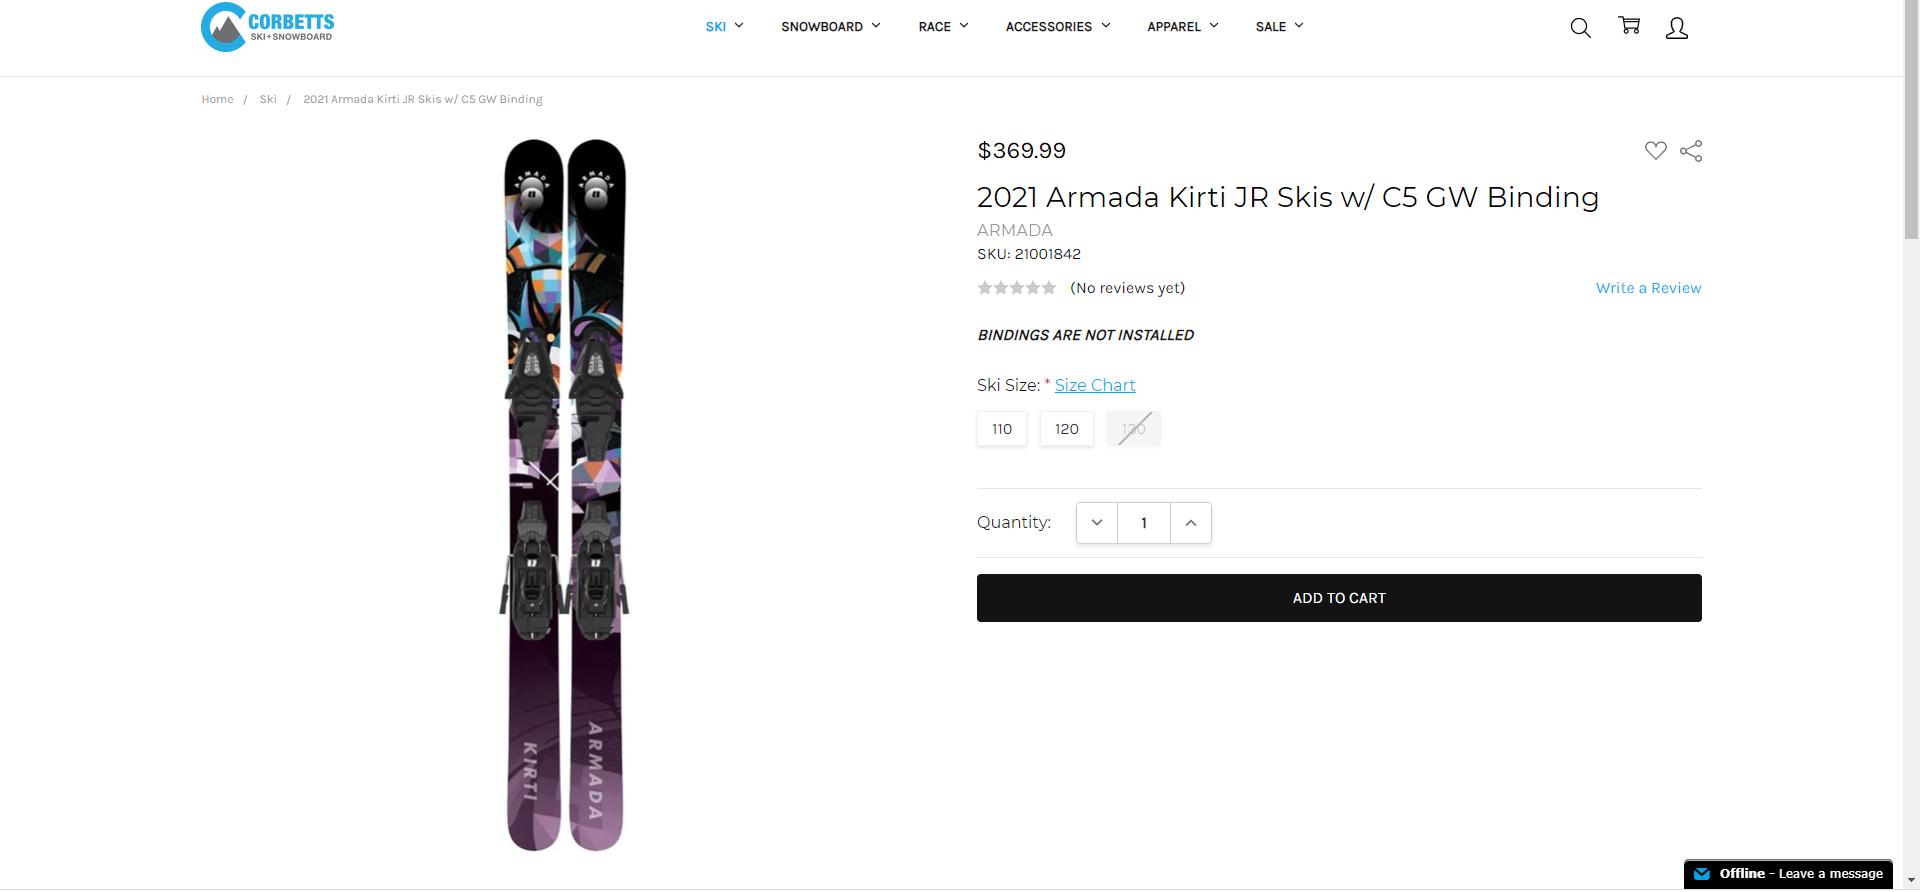 Best Skis 2021 - Armada Kirti